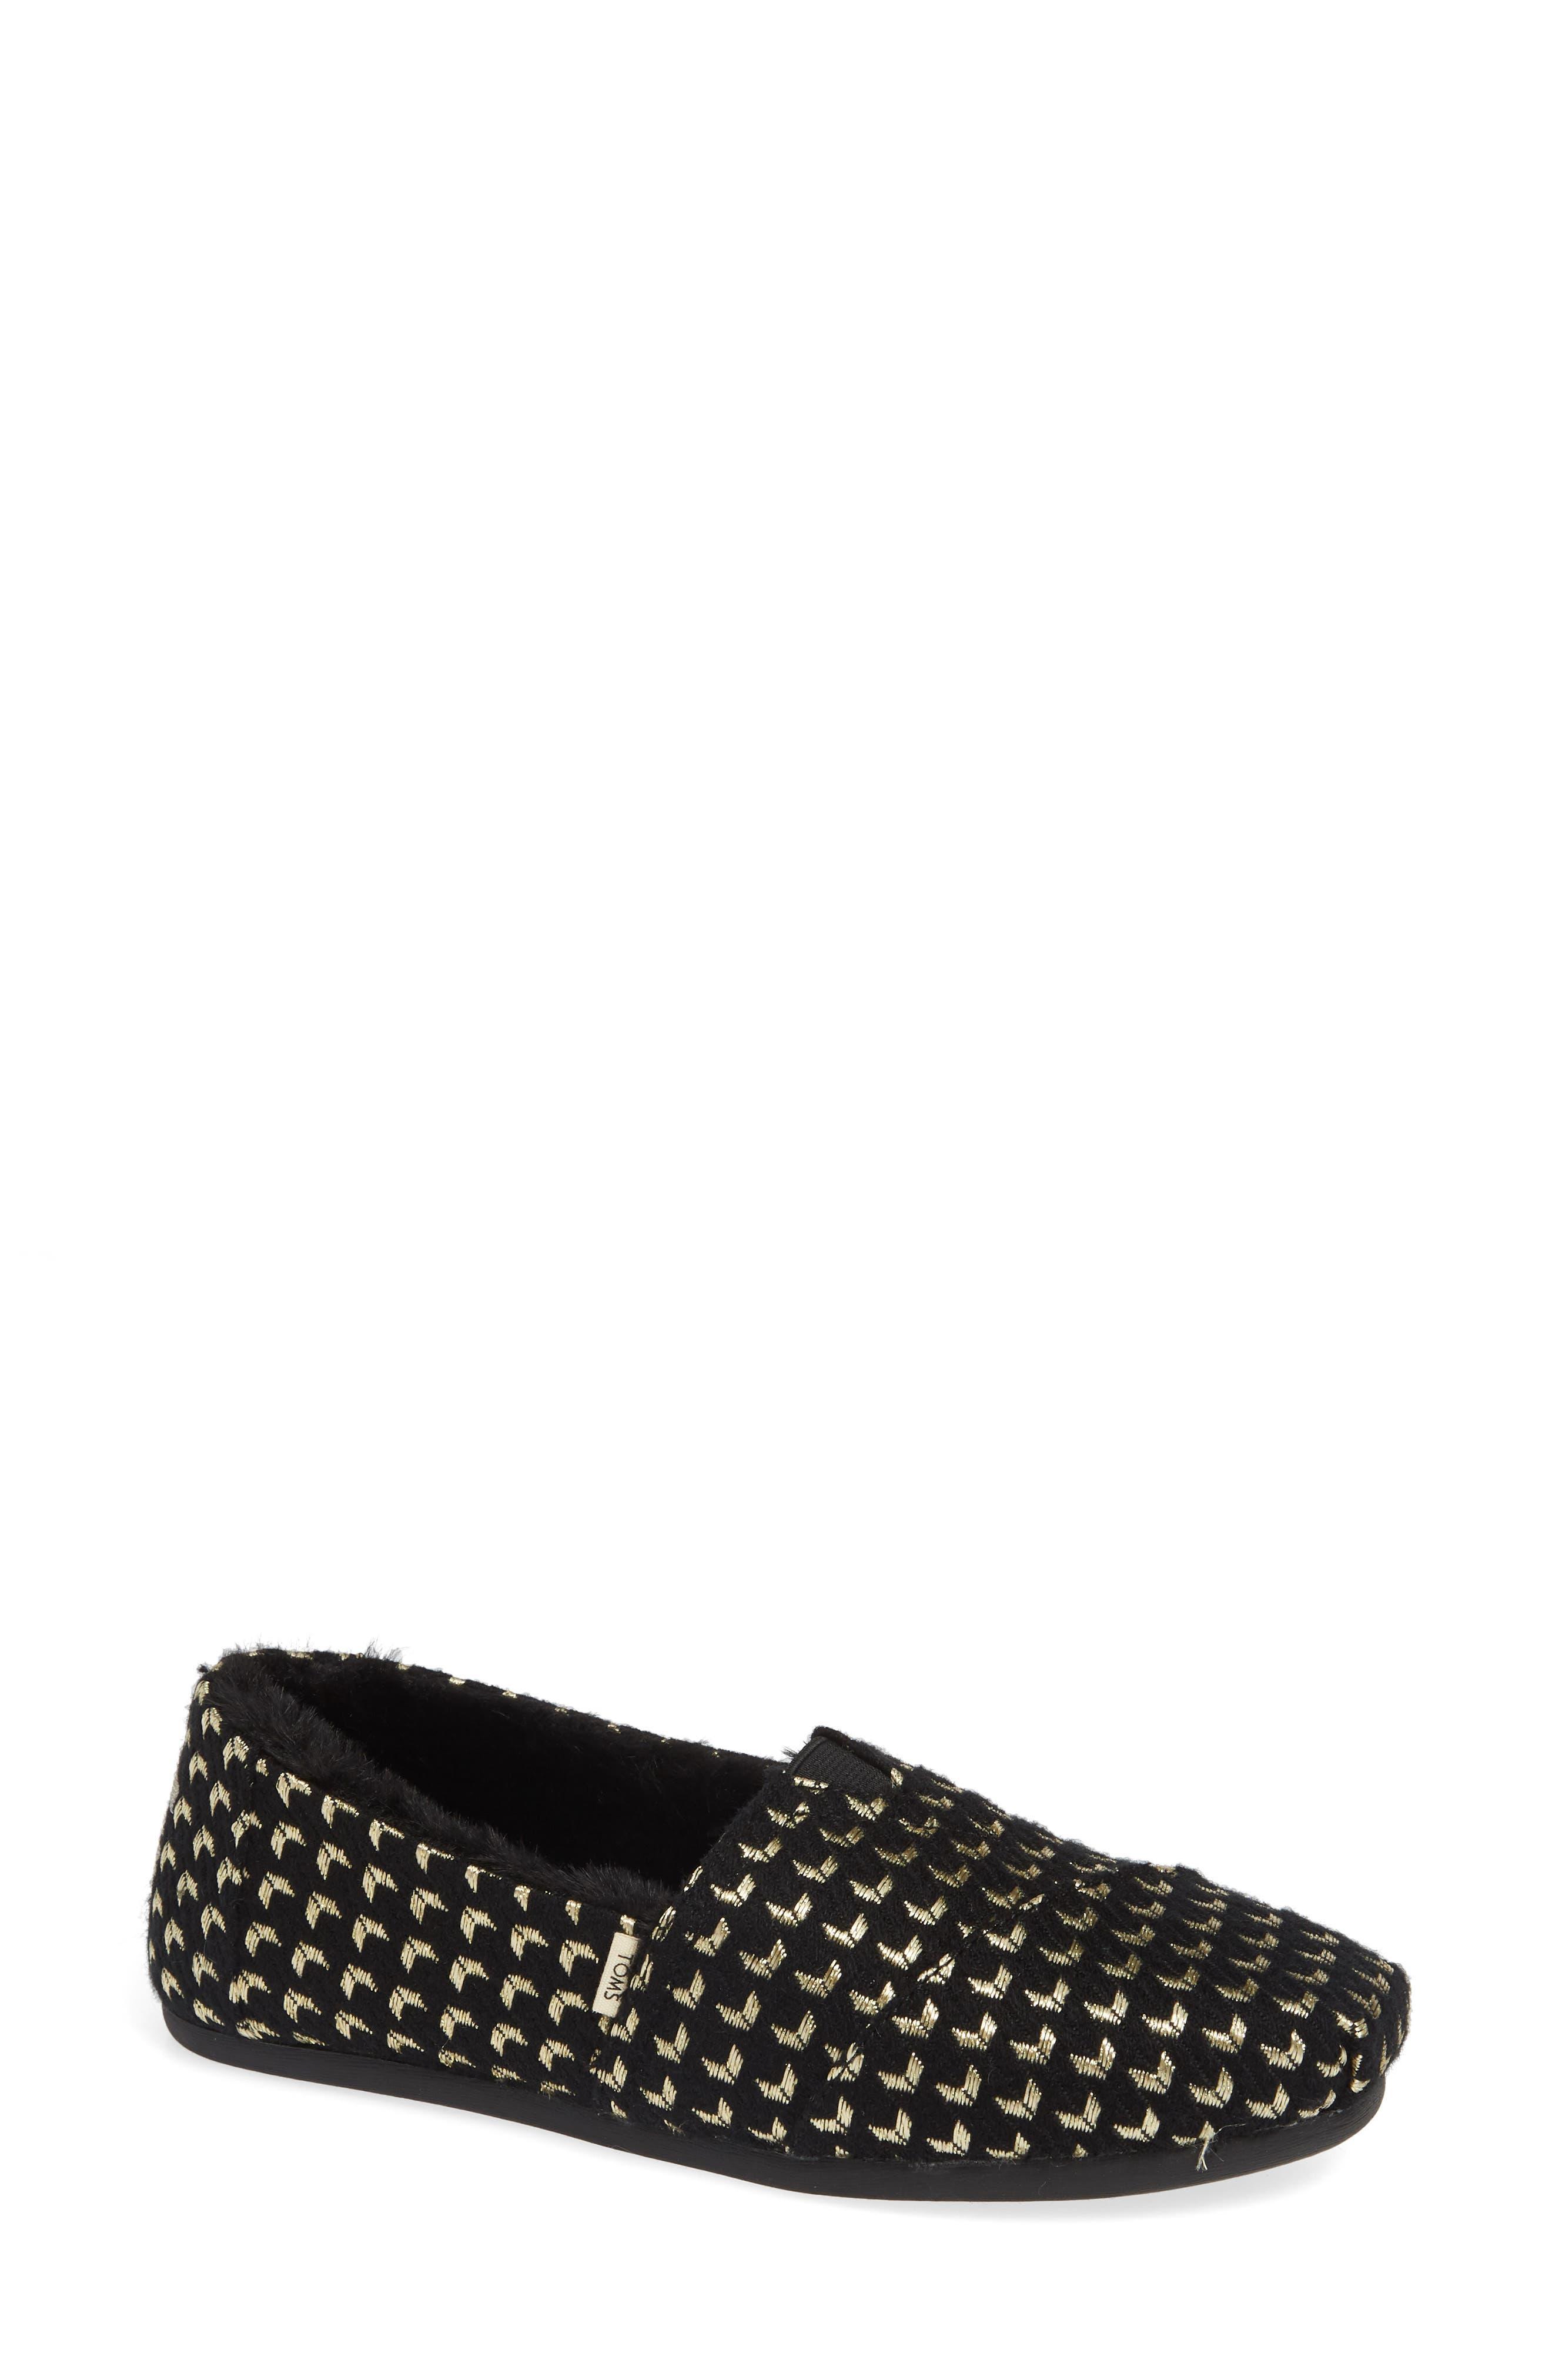 TOMS Alpargata Slip-On, Main, color, BLACK GEO PRINT FABRIC